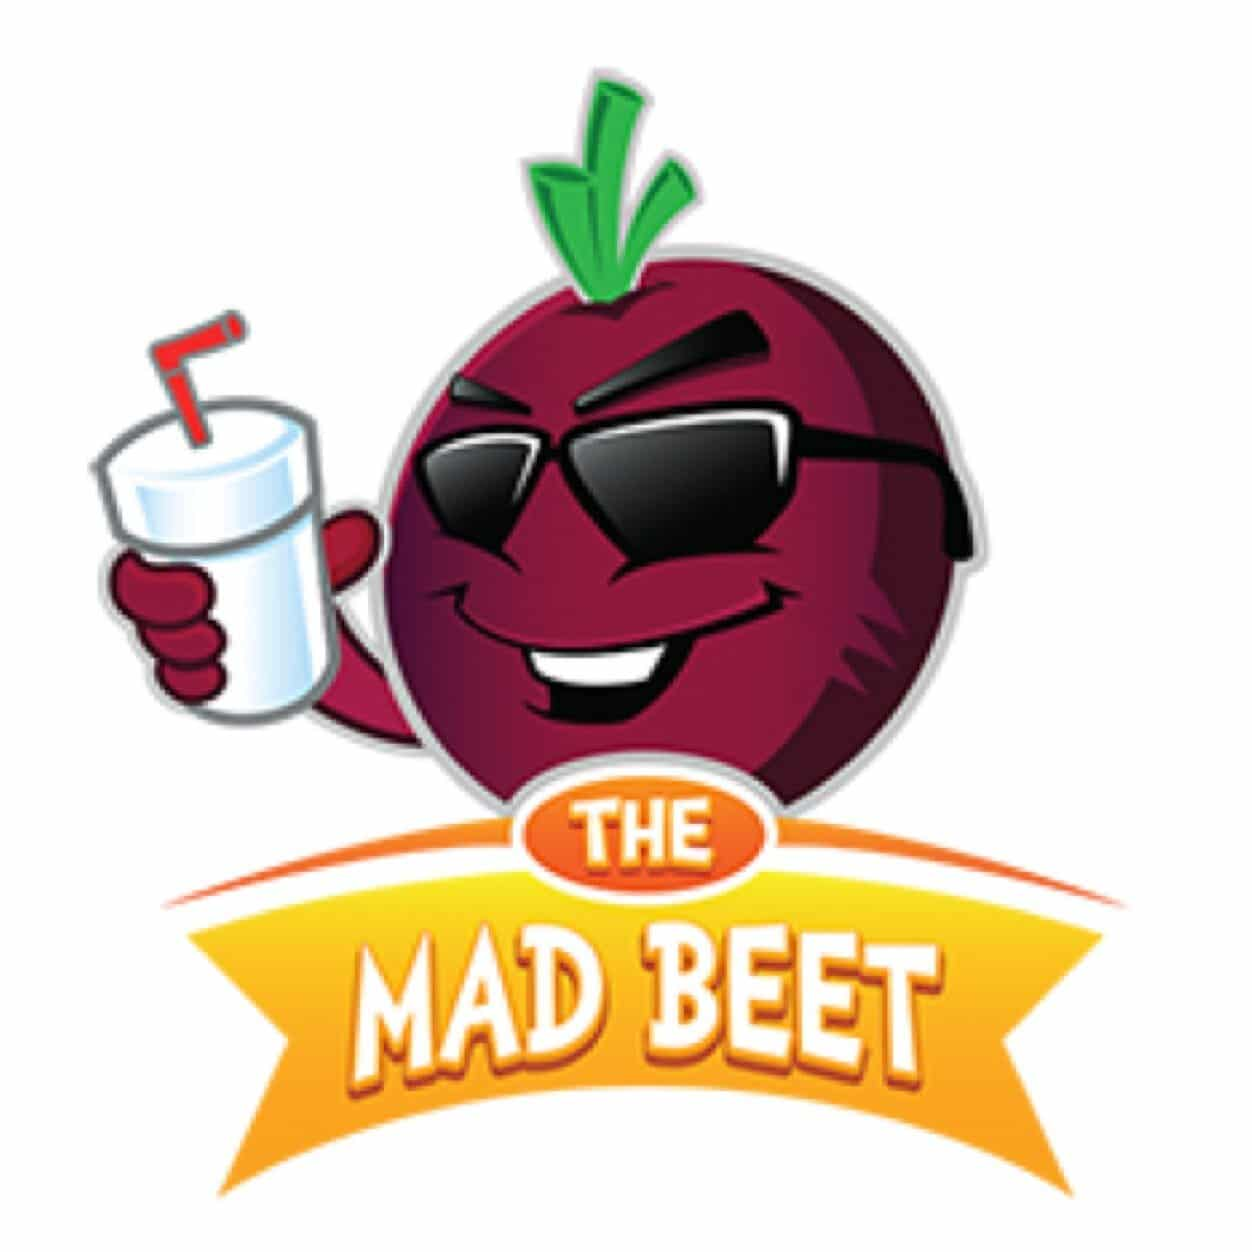 The Mad Beet logo